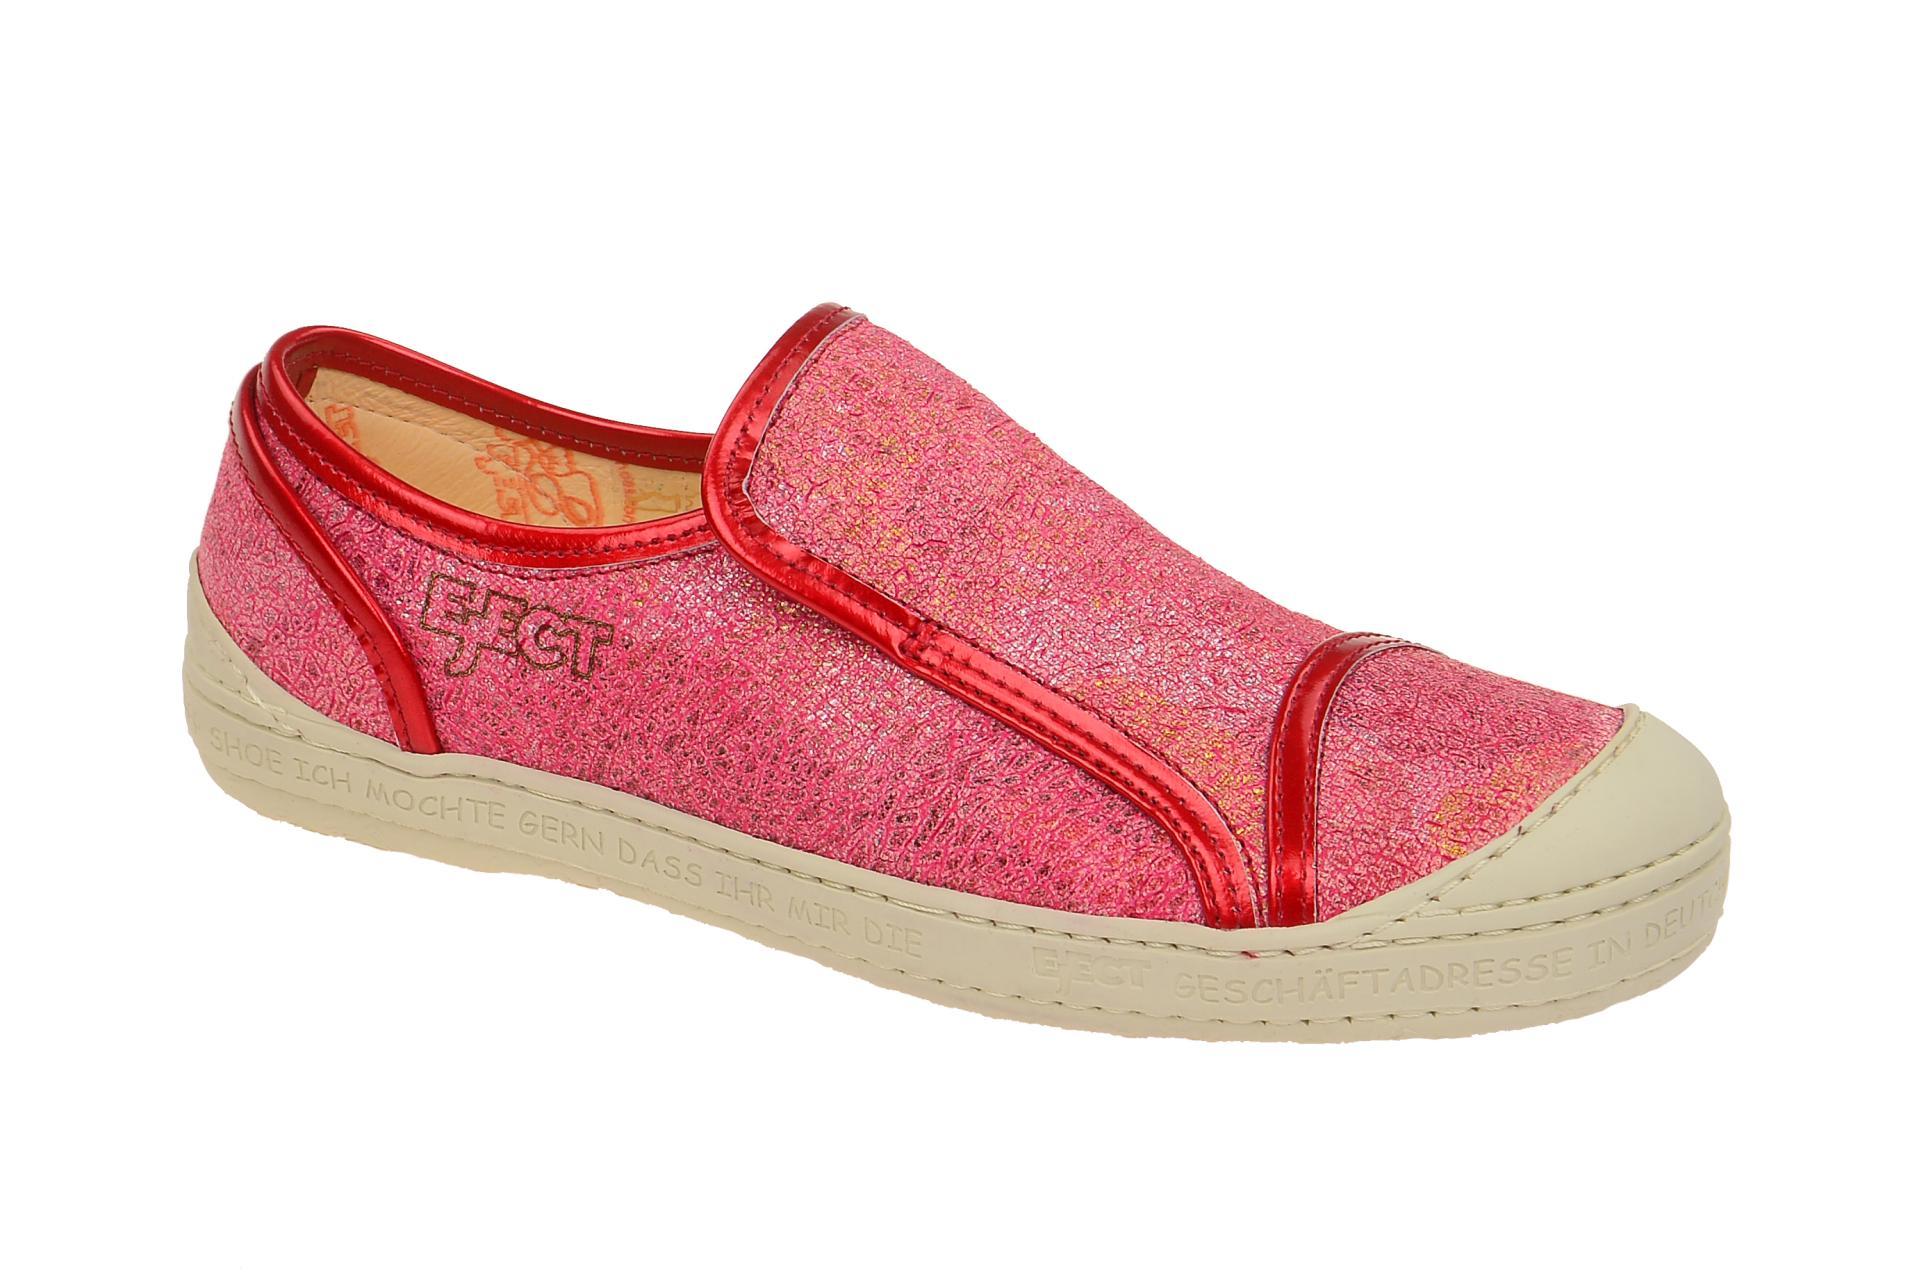 Eject DASS Slipper für Damen in rot - 16221/2.006 red peqYcyrO